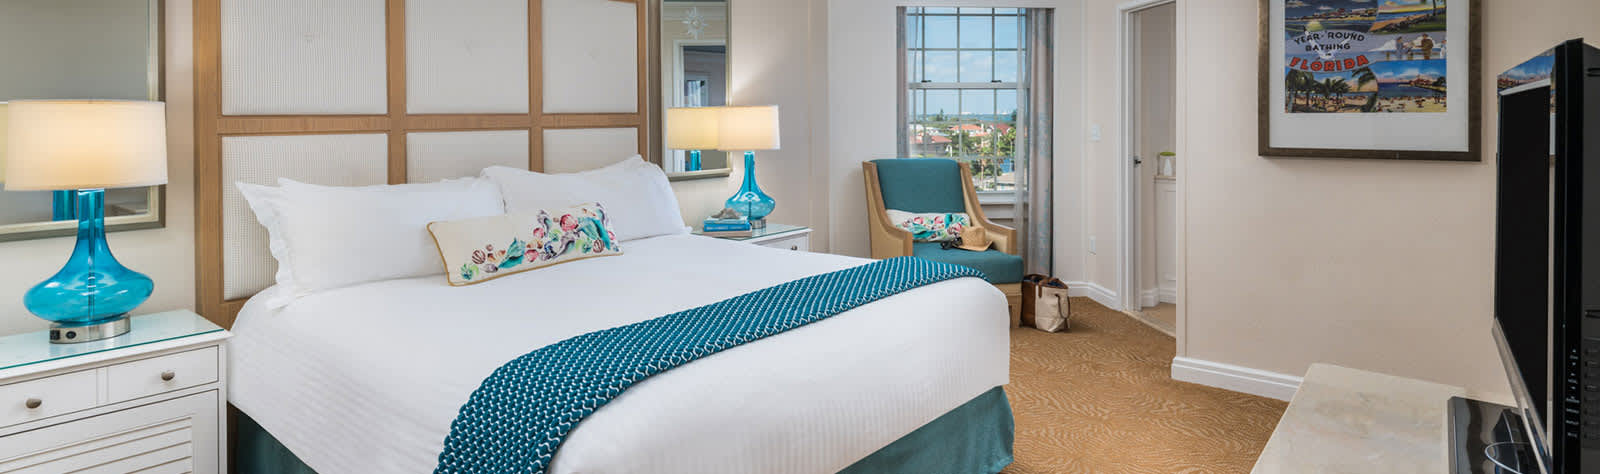 Rooms at The Don CeSar, Florida